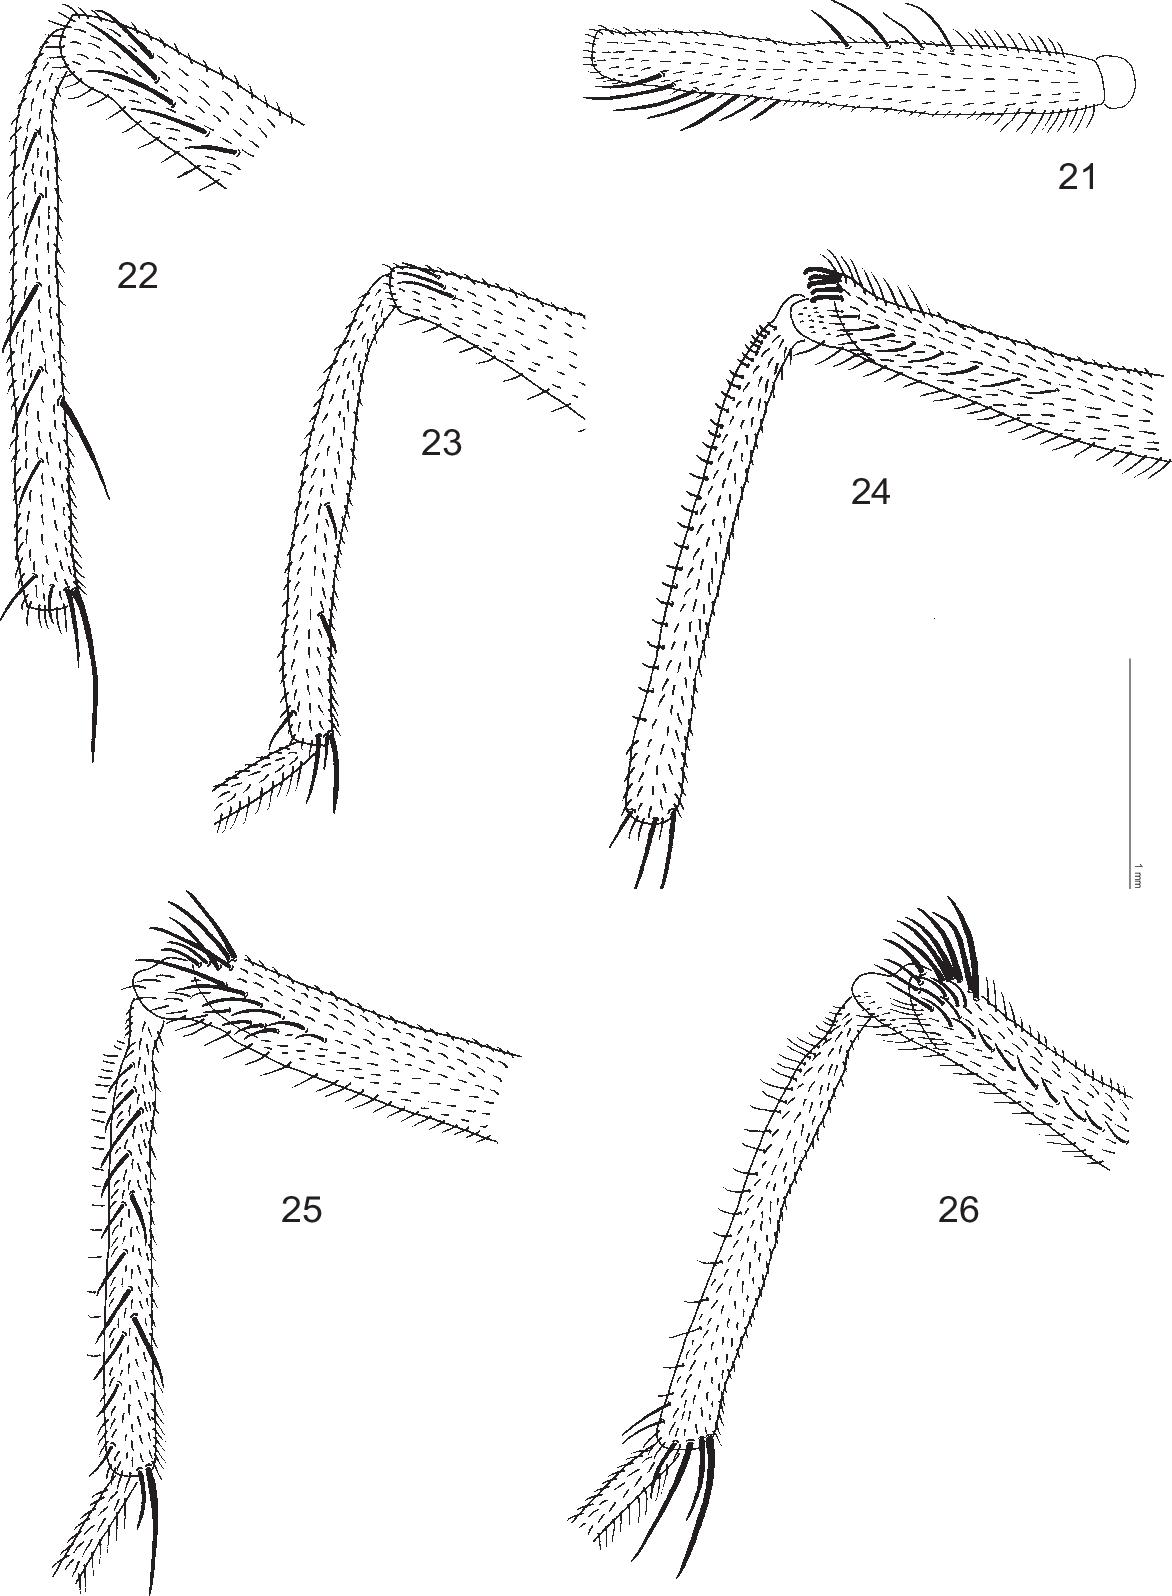 figure 21–26